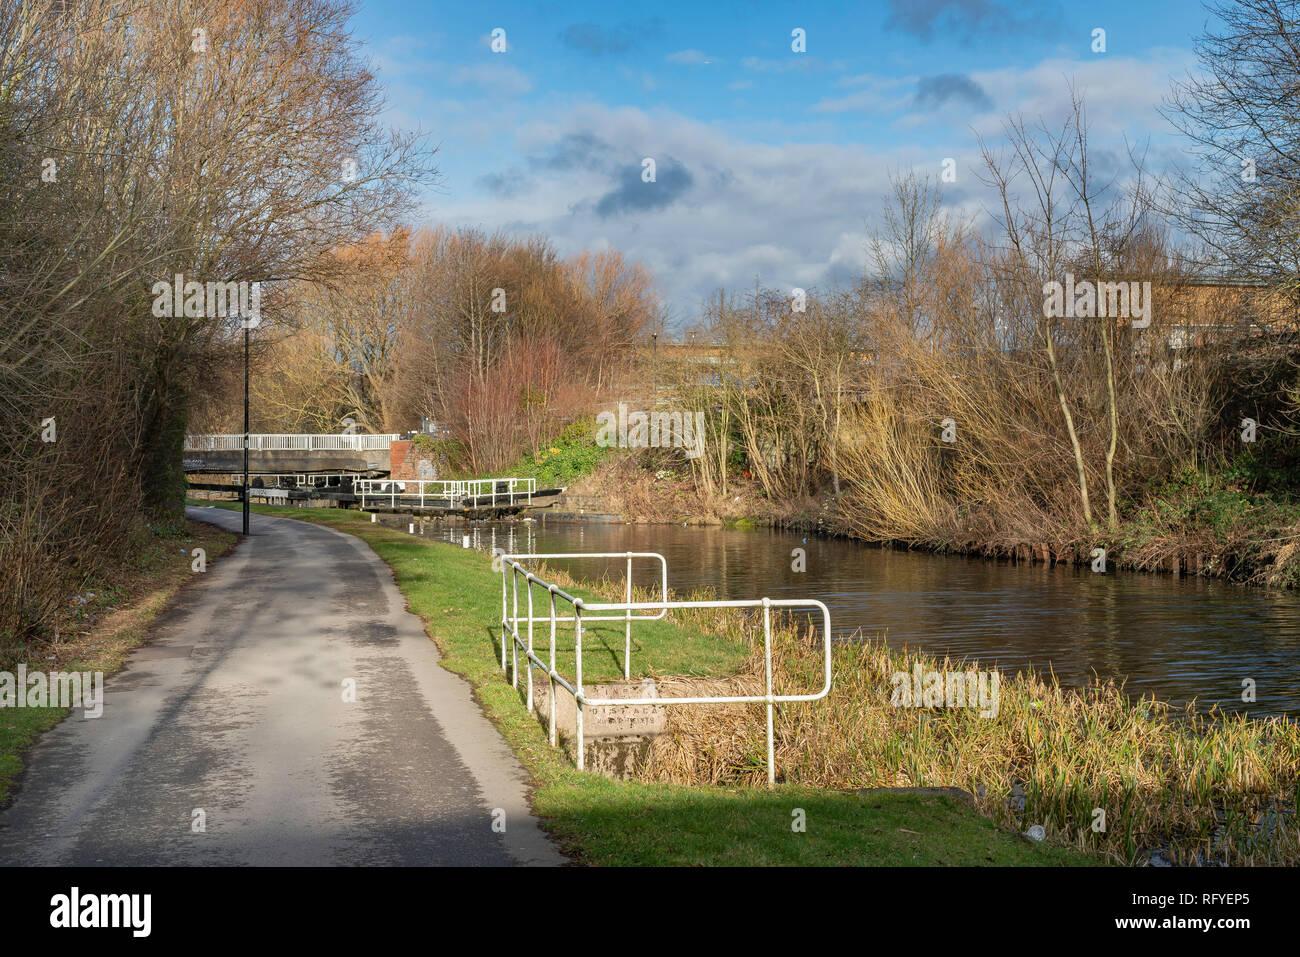 The Don Navigation, Tinsley, Rotherham, South Yorkshire, UK - Stock Image